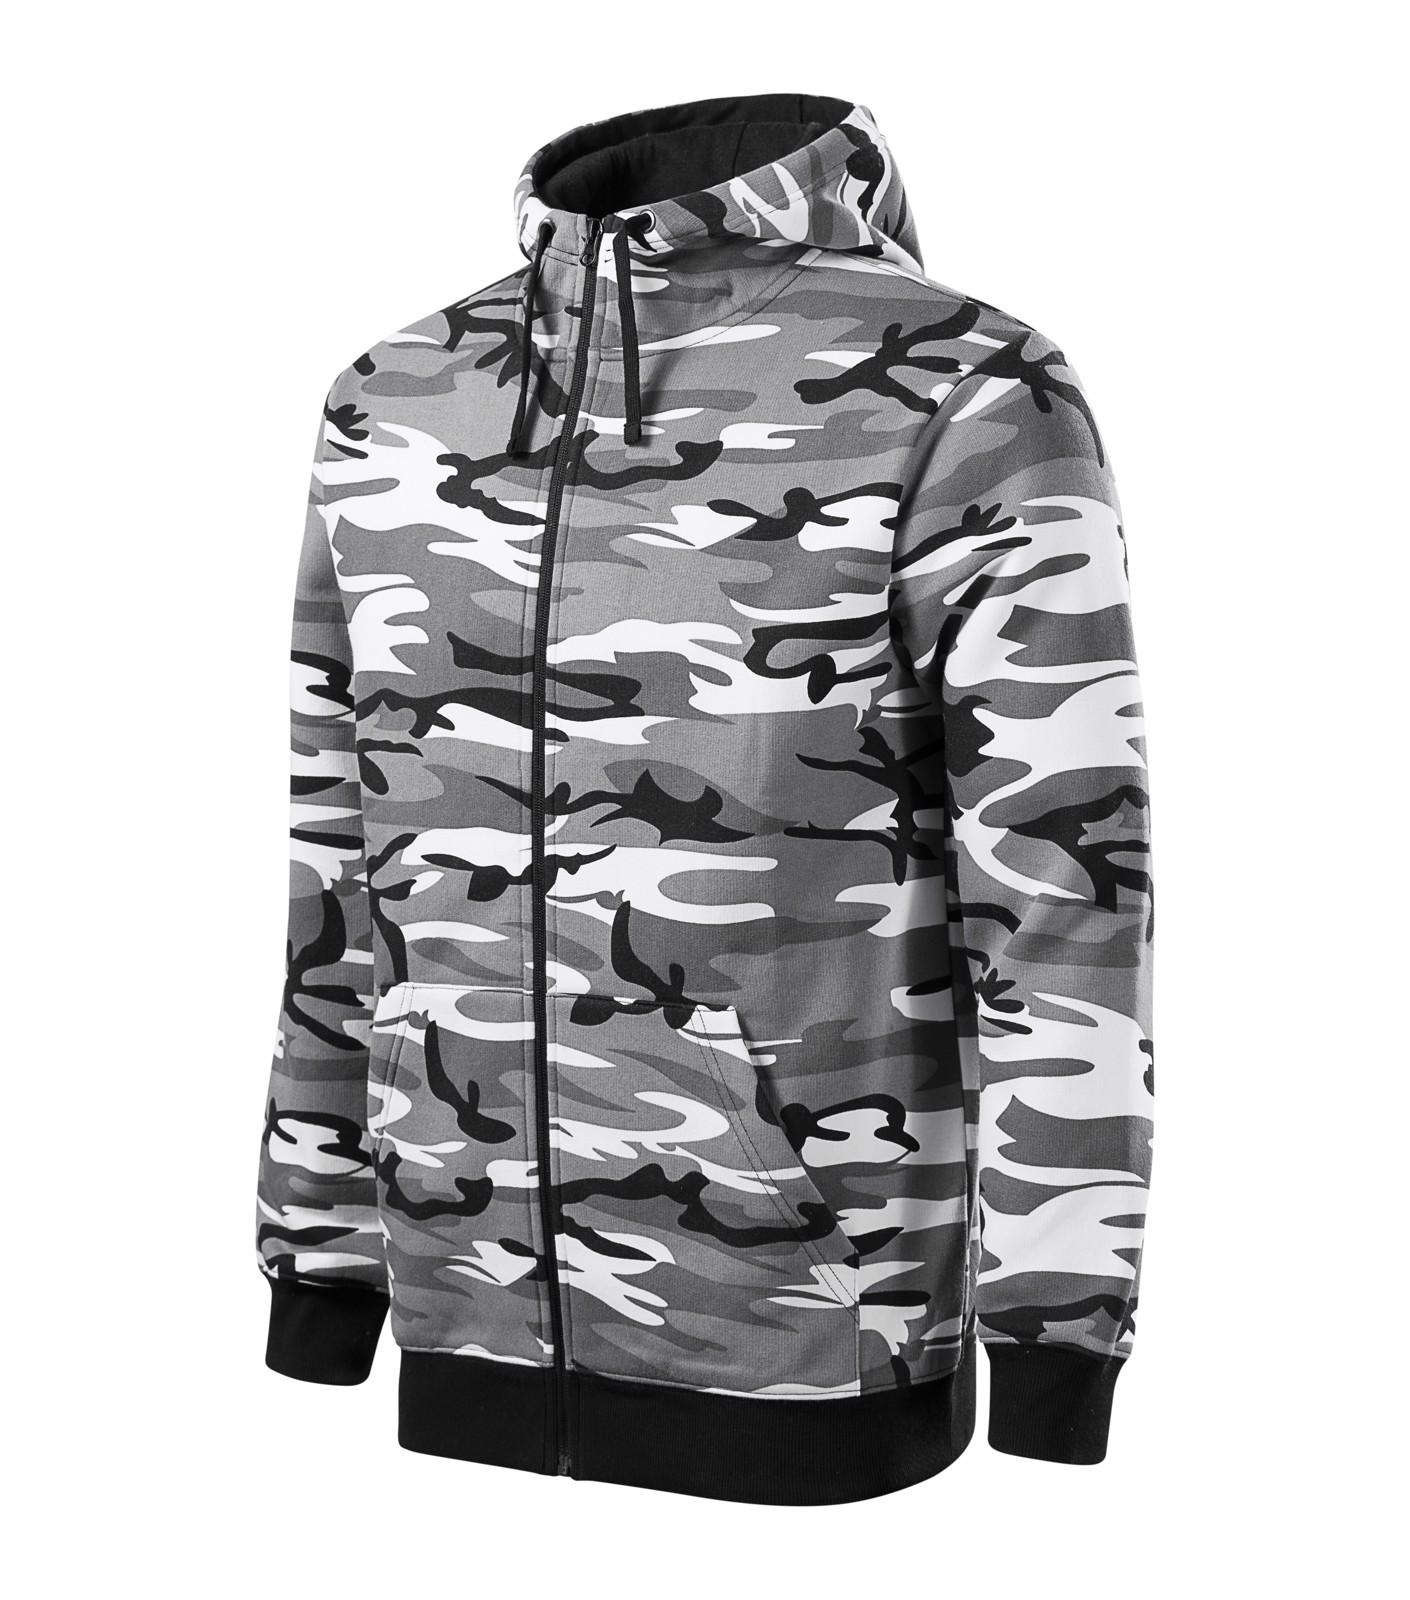 Mikina pánská Malfini Camo Zipper - Camouflage Gray / S